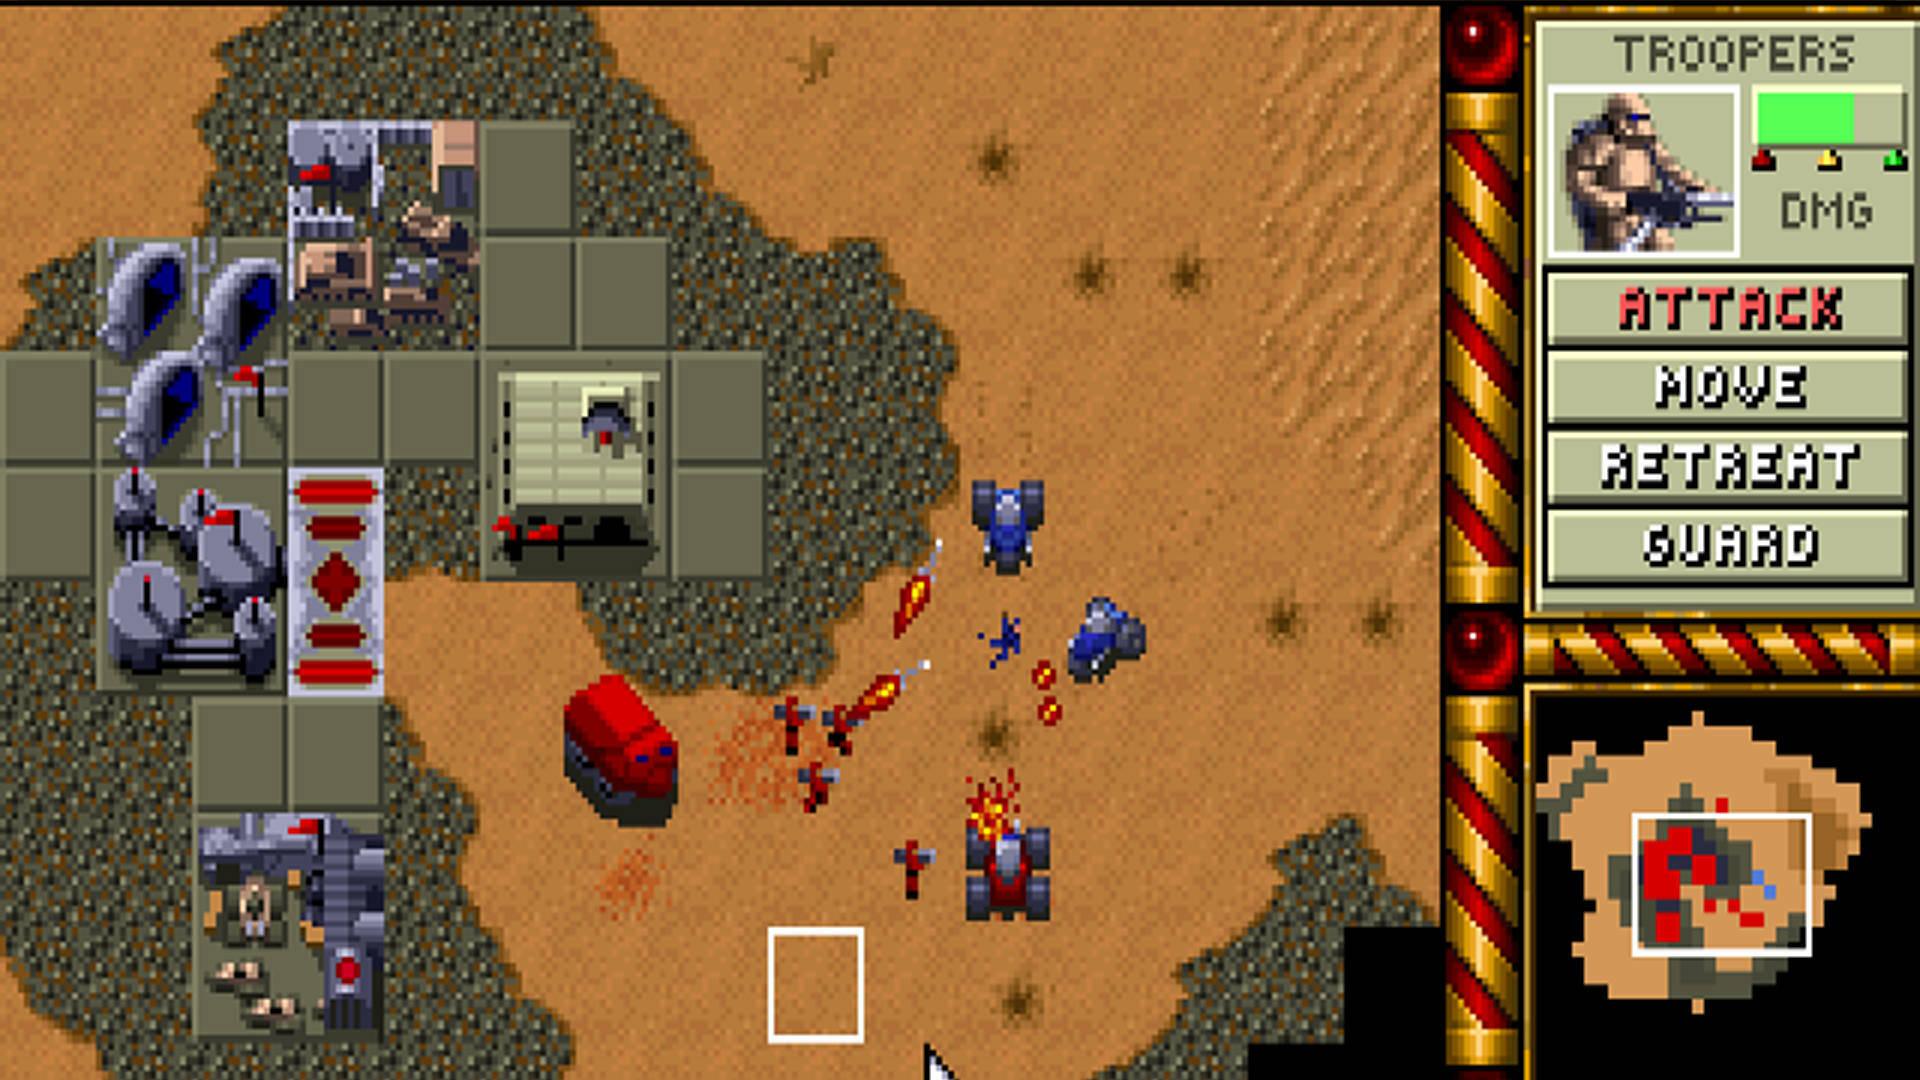 Videogames a tema Dune